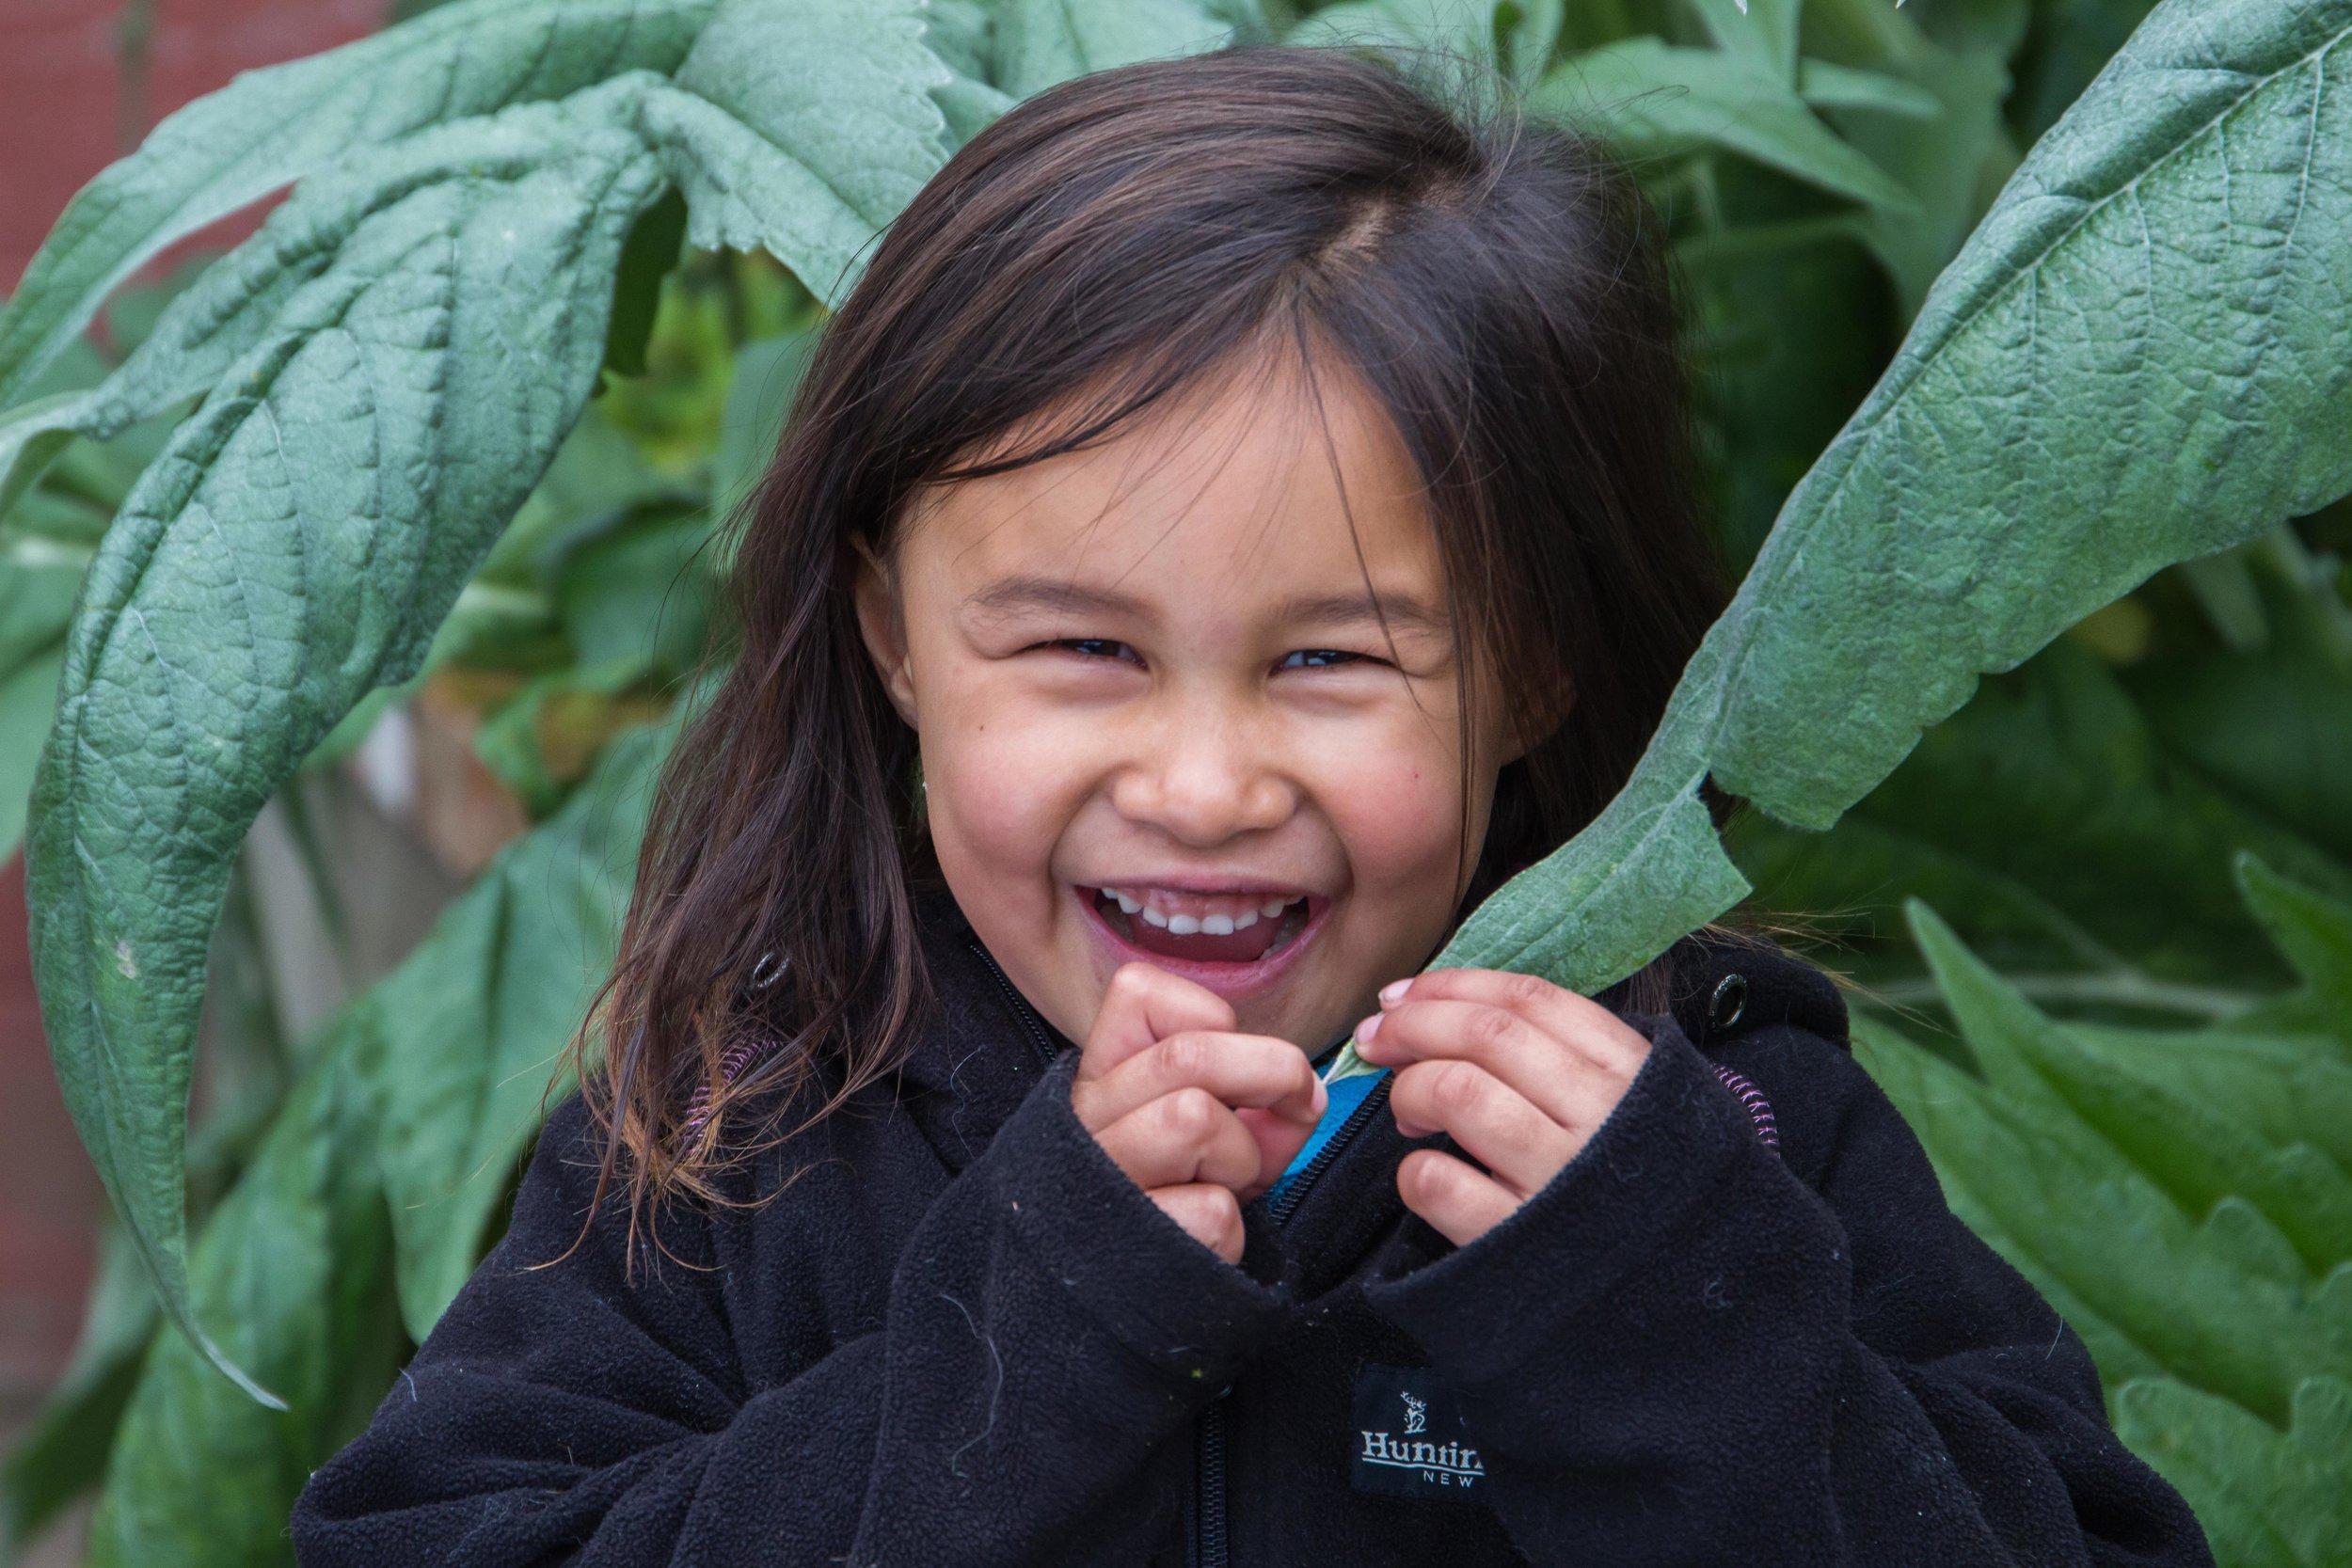 TePunaTaiao-HamiltonGardens(veg)-Highres-7351.jpg